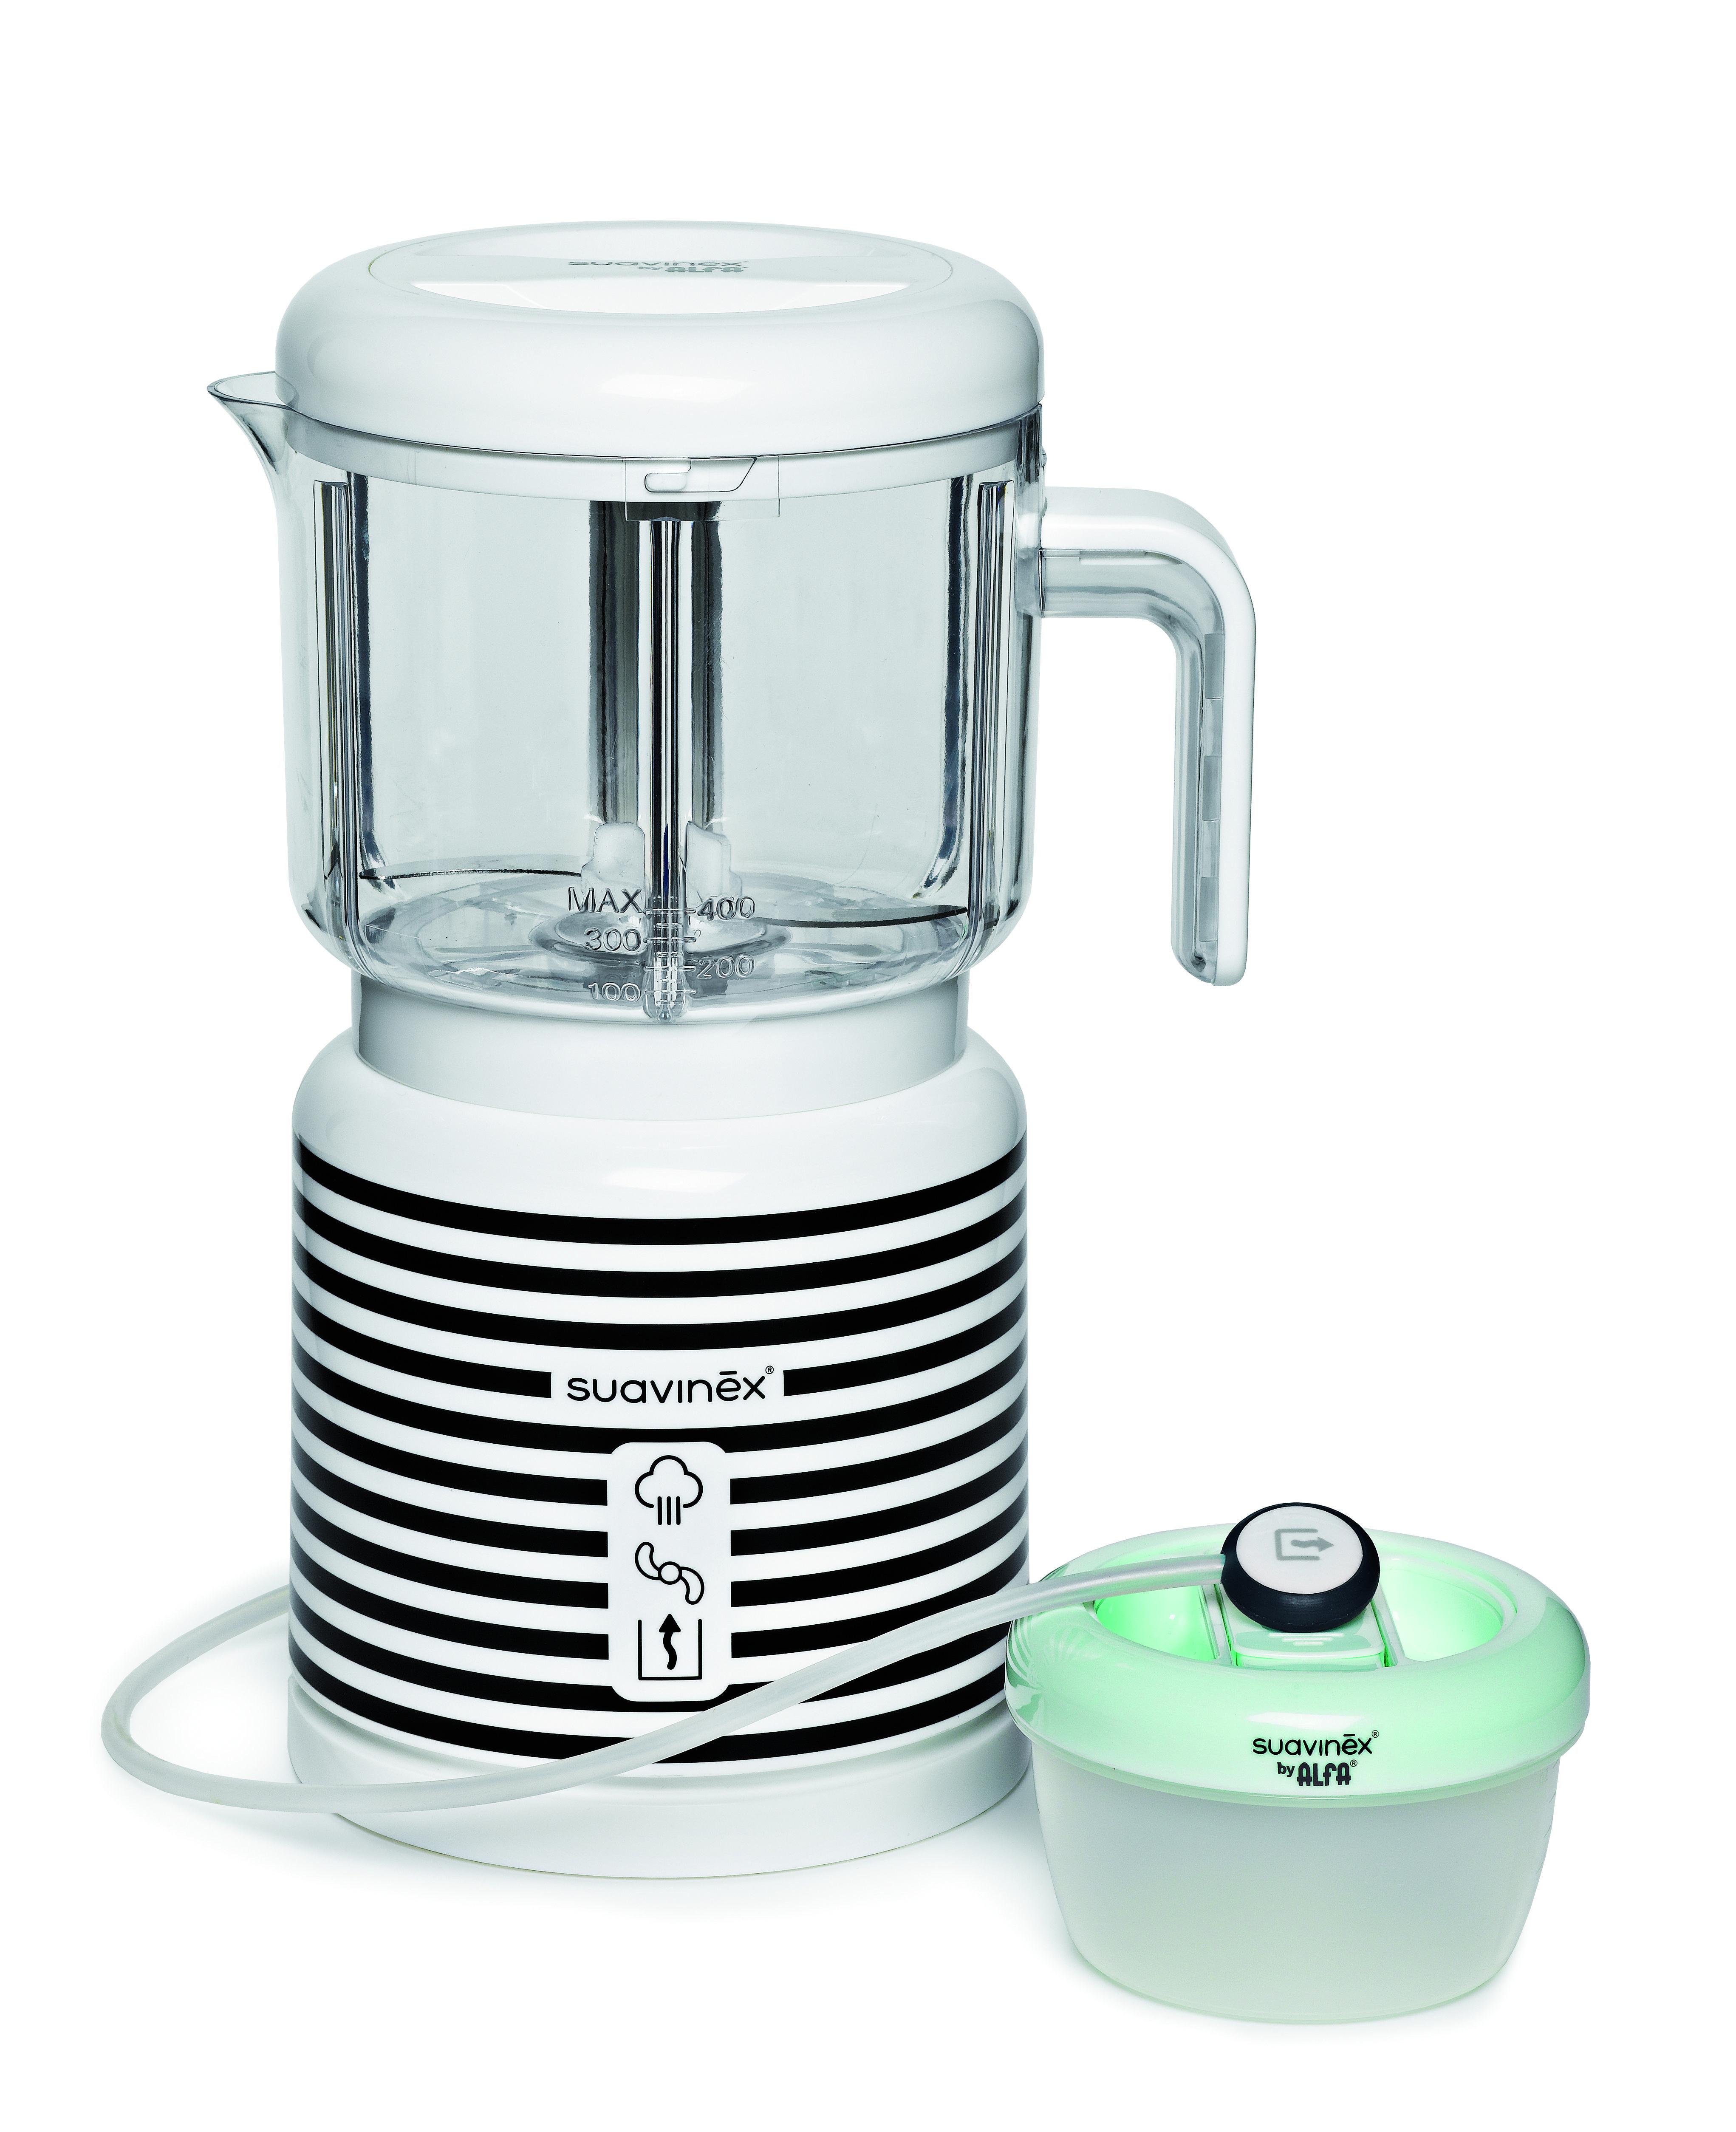 Robot de cocina link suavinex - Robot de cocina cocichef ...